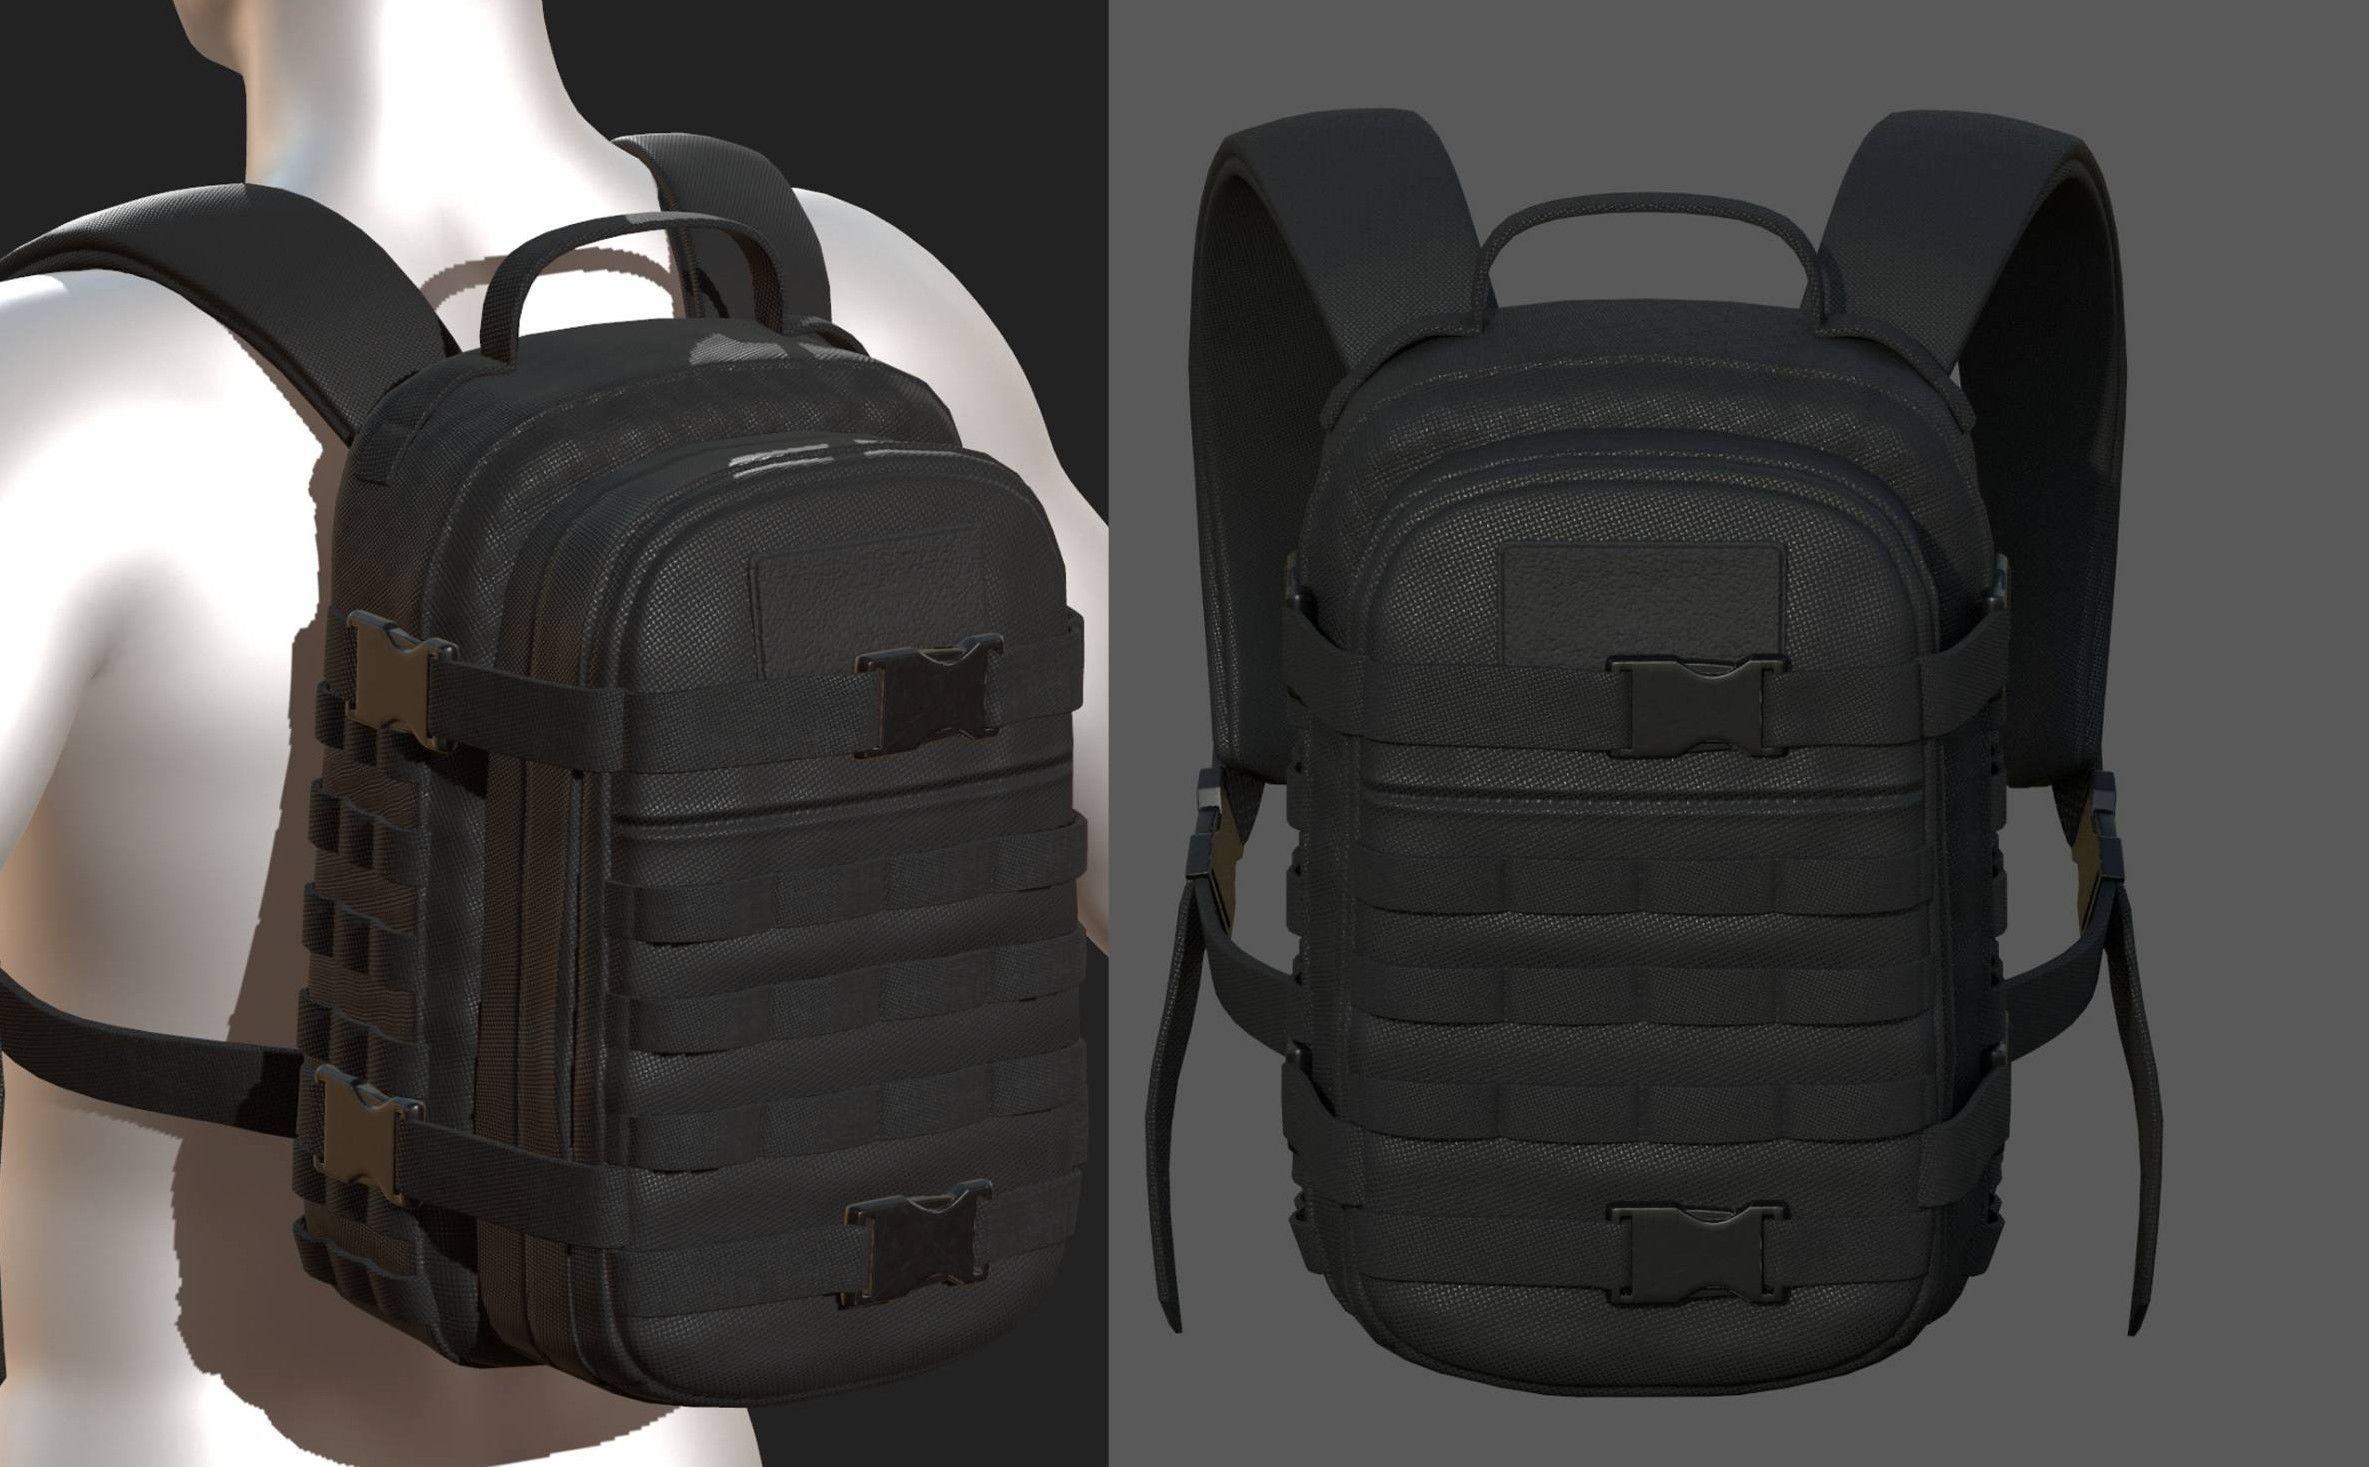 Backpack military combat Black baggage bag luggage